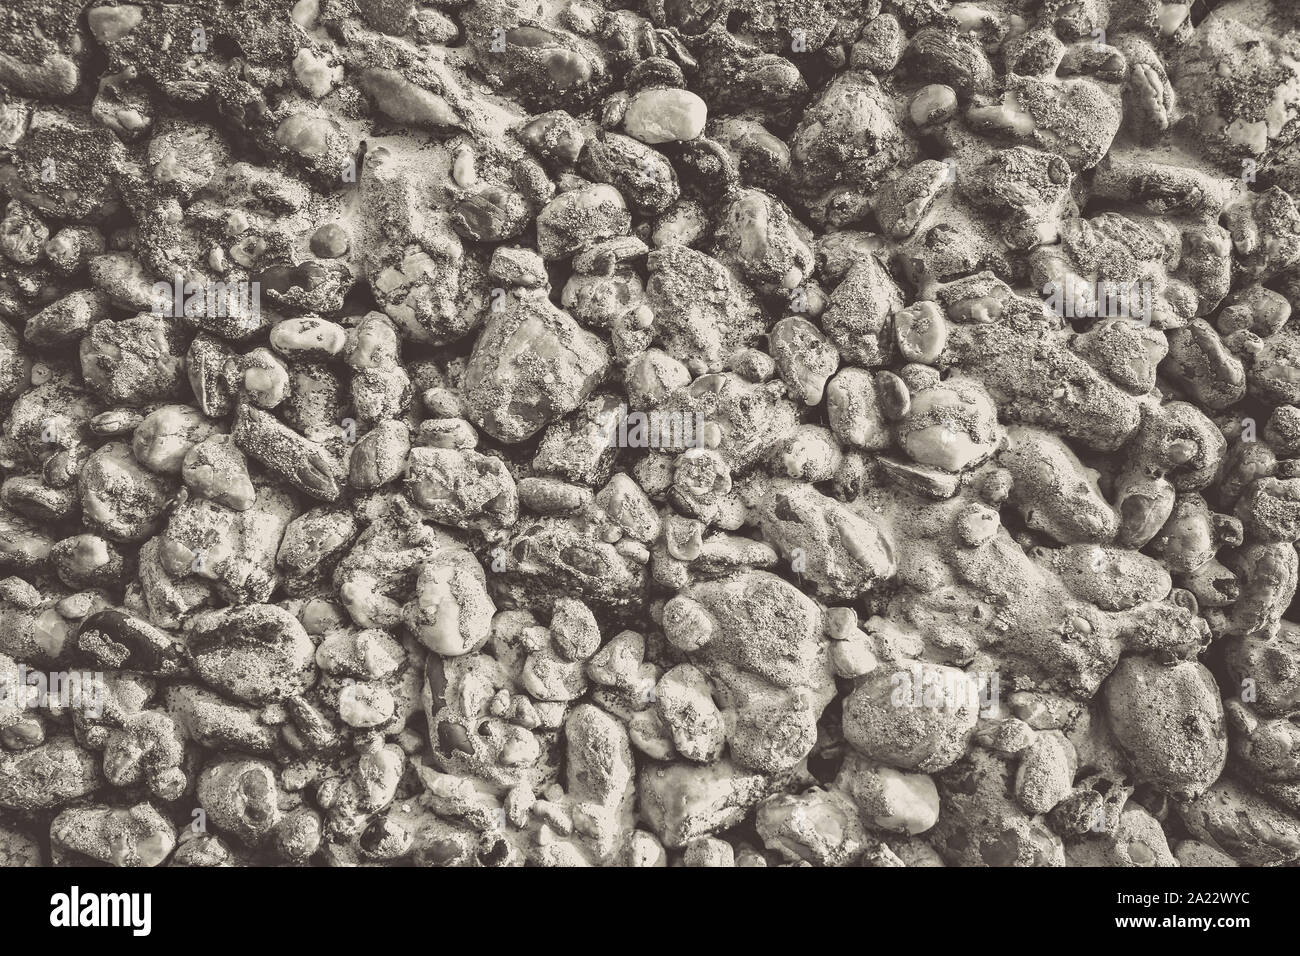 Grit Gravel Immagini & Grit Gravel Fotos Stock Alamy